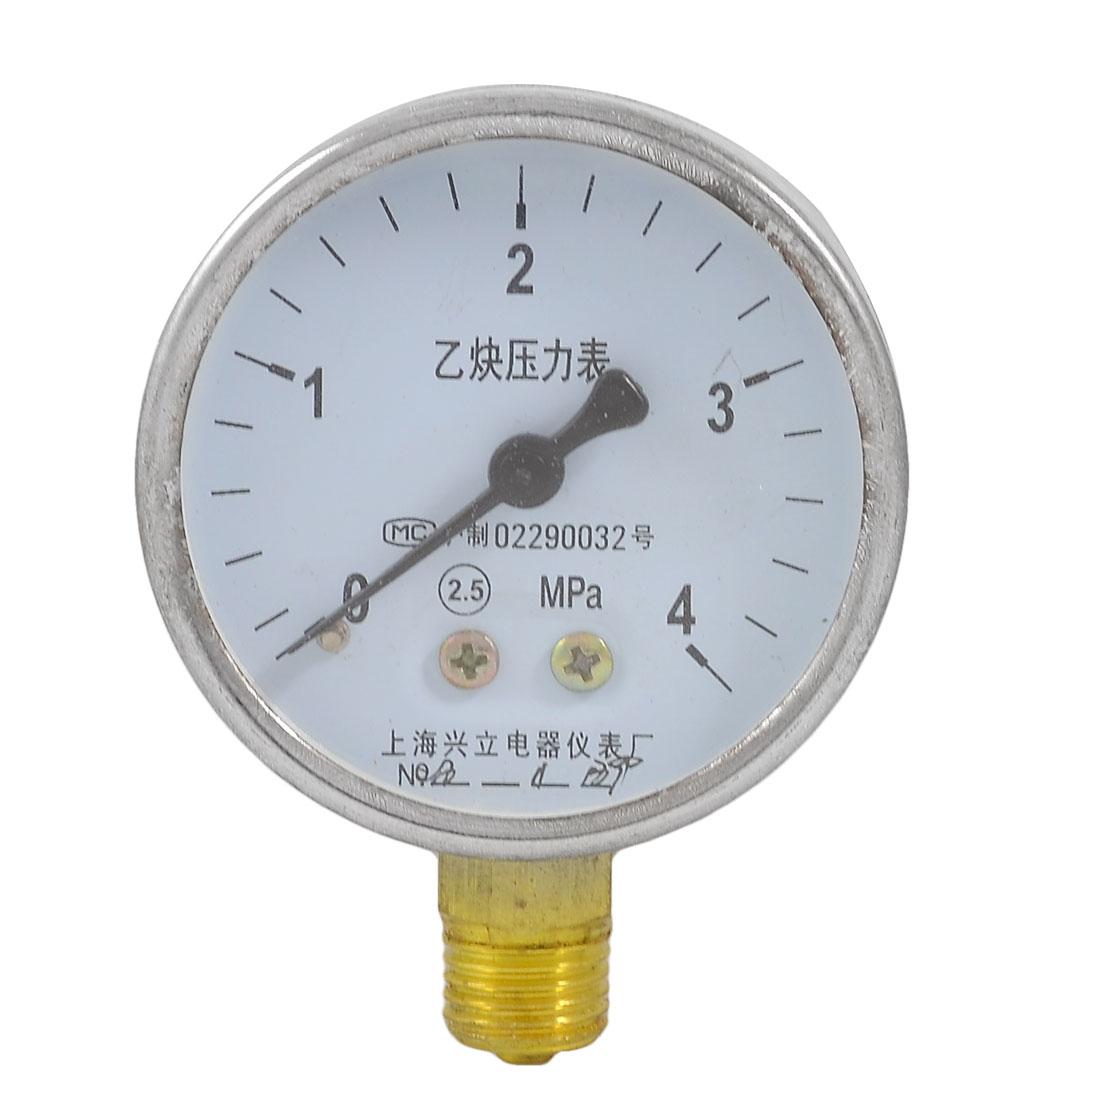 0-4 Mpa 14mm Thread Metal Shell Acetylene Pressure Gauge